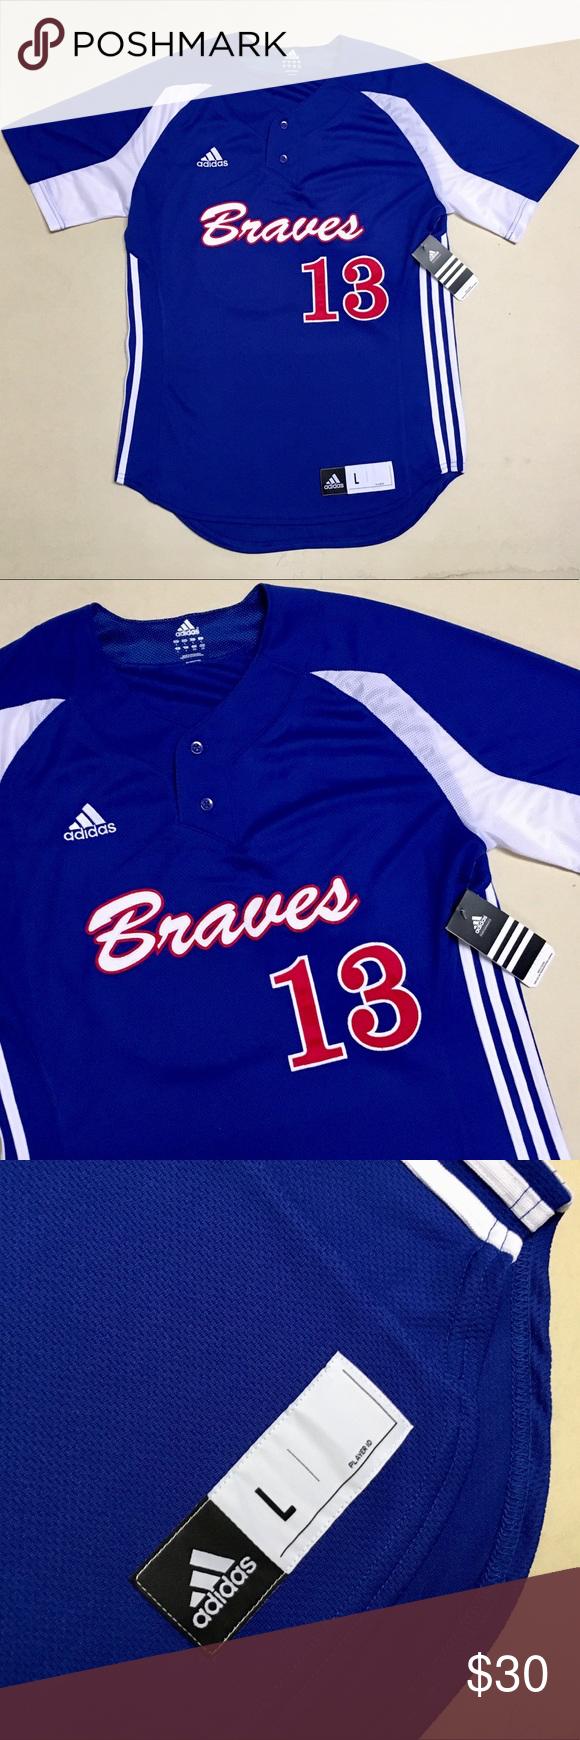 Vintage Atlanta Braves New Adidas Men S Jersey Nwt With Images Adidas Men New Adidas Atlanta Braves